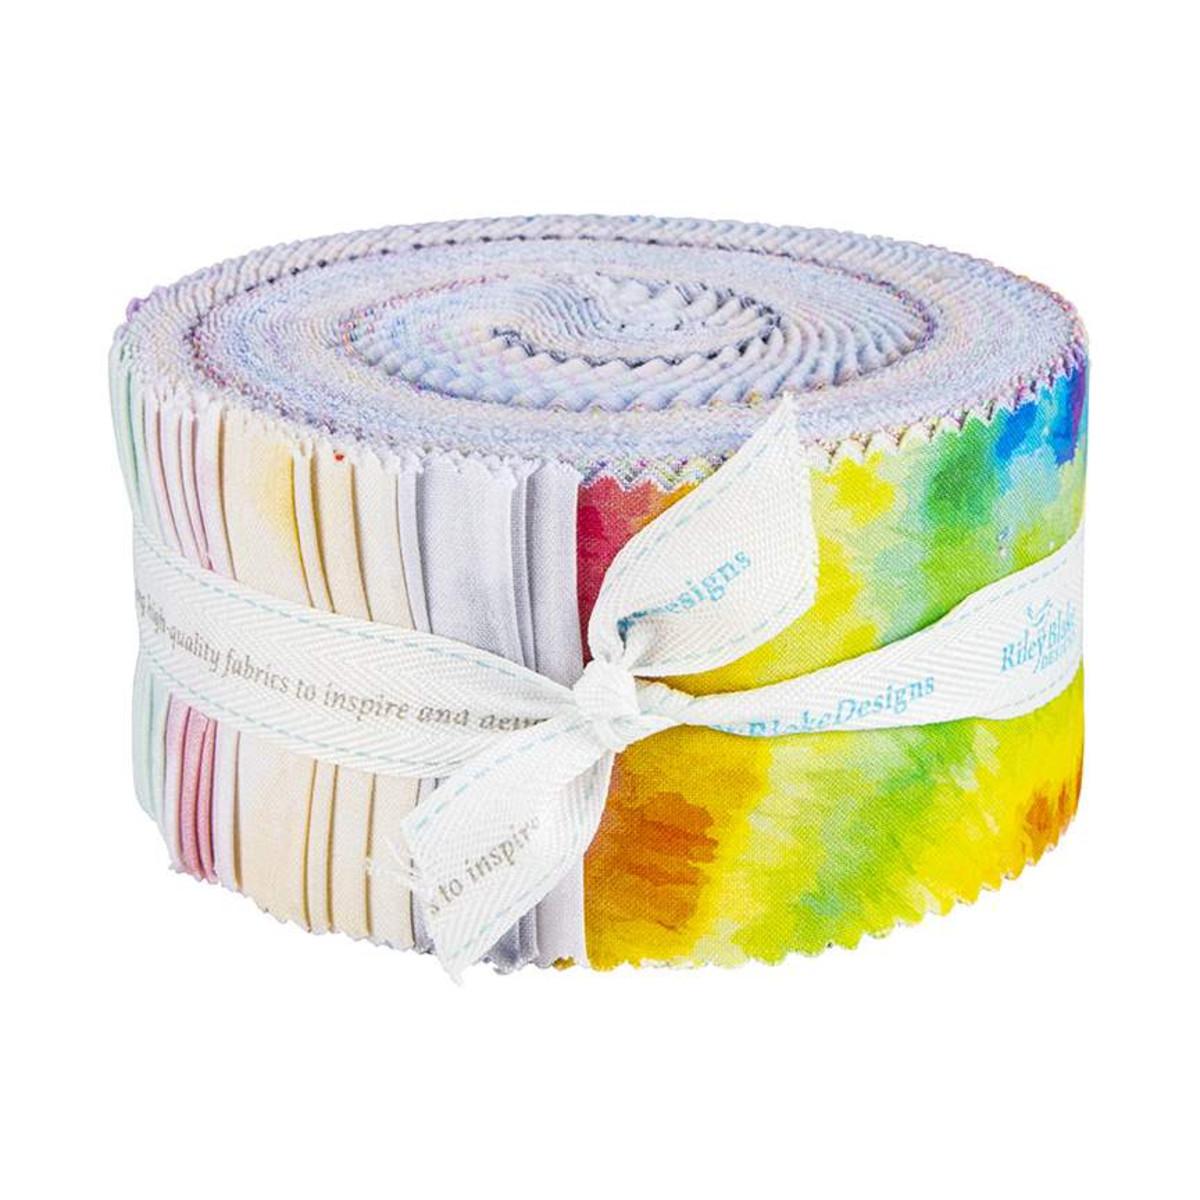 Riley Blake Jelly Roll - Tie Dye by The RBD Designers